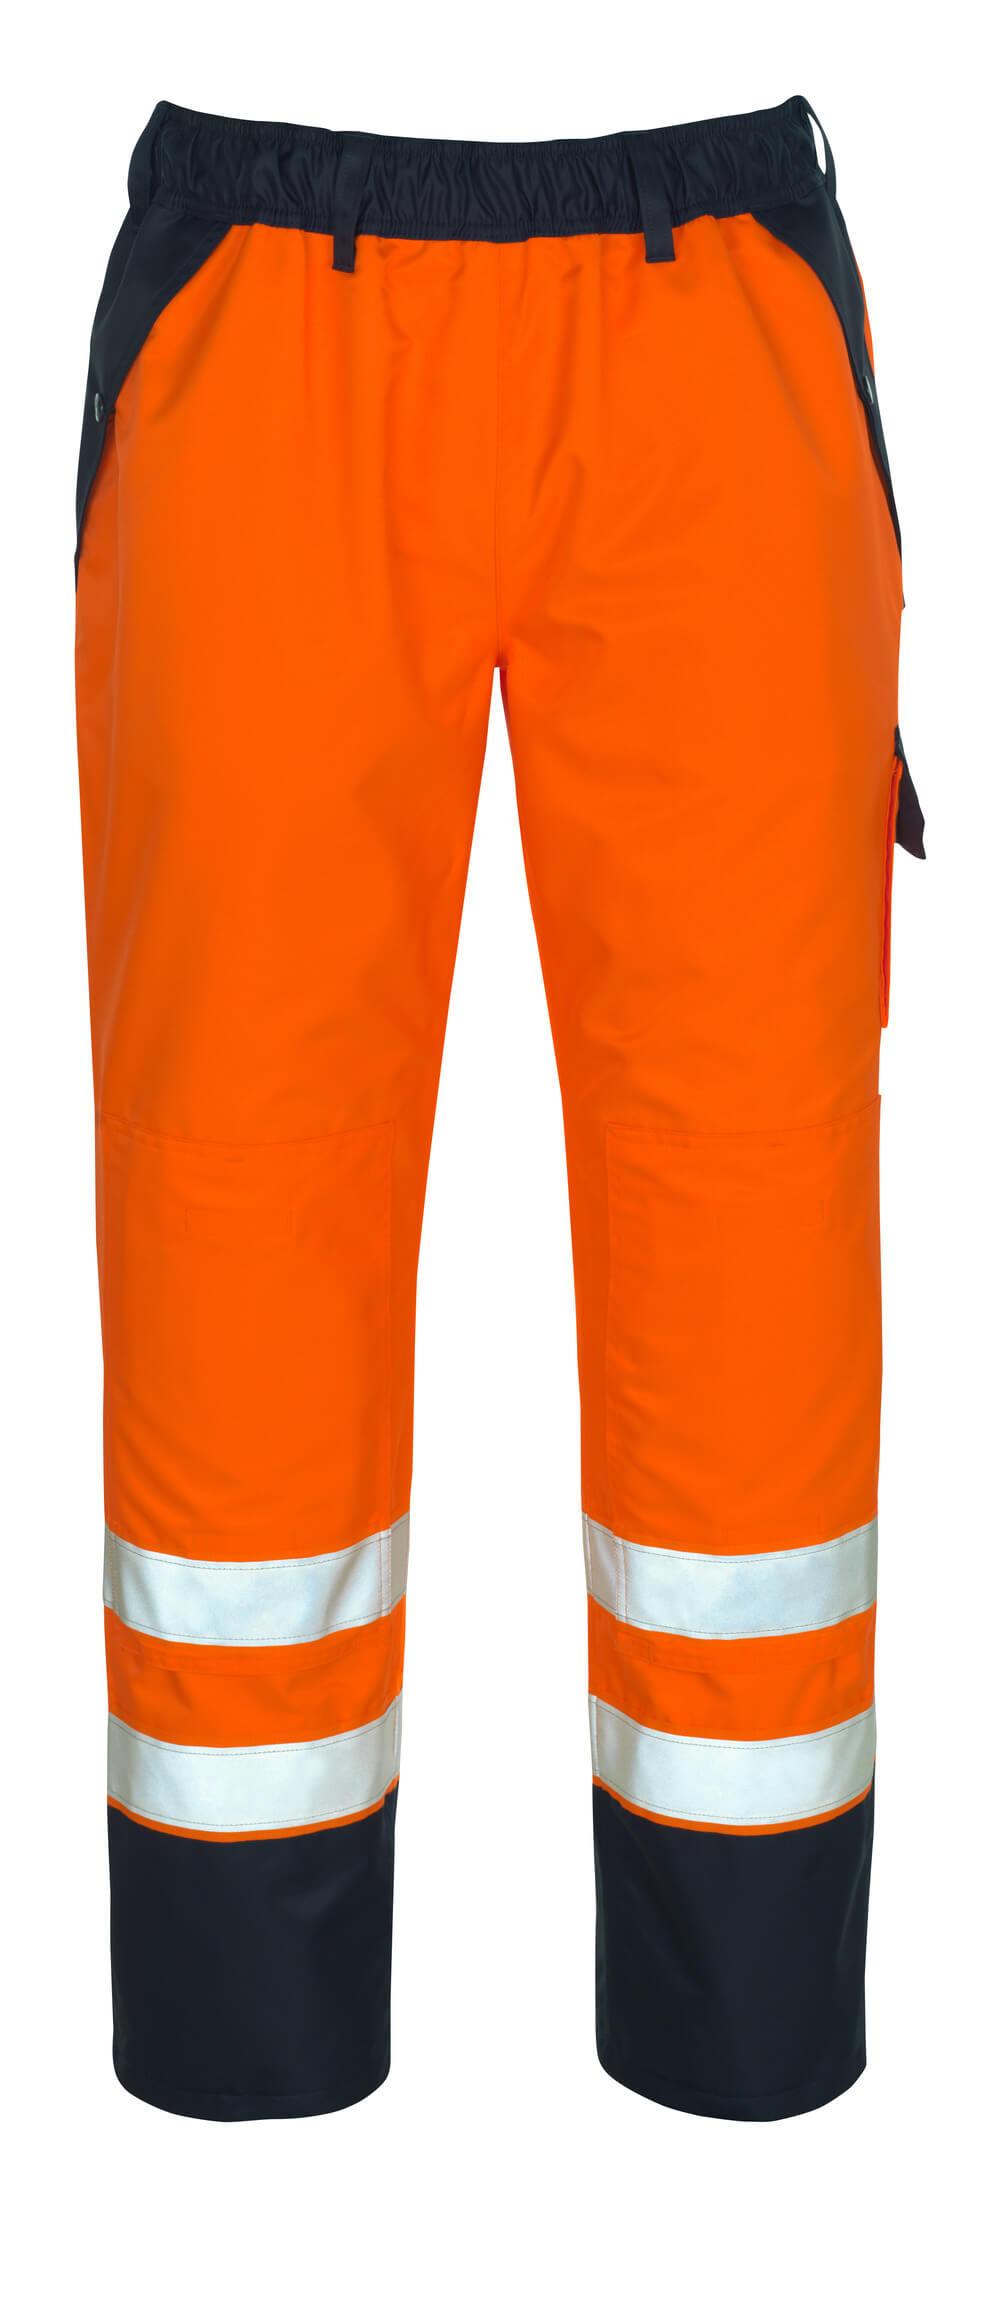 07090-880-141 Overtrekbroek - hi-vis oranje/marine